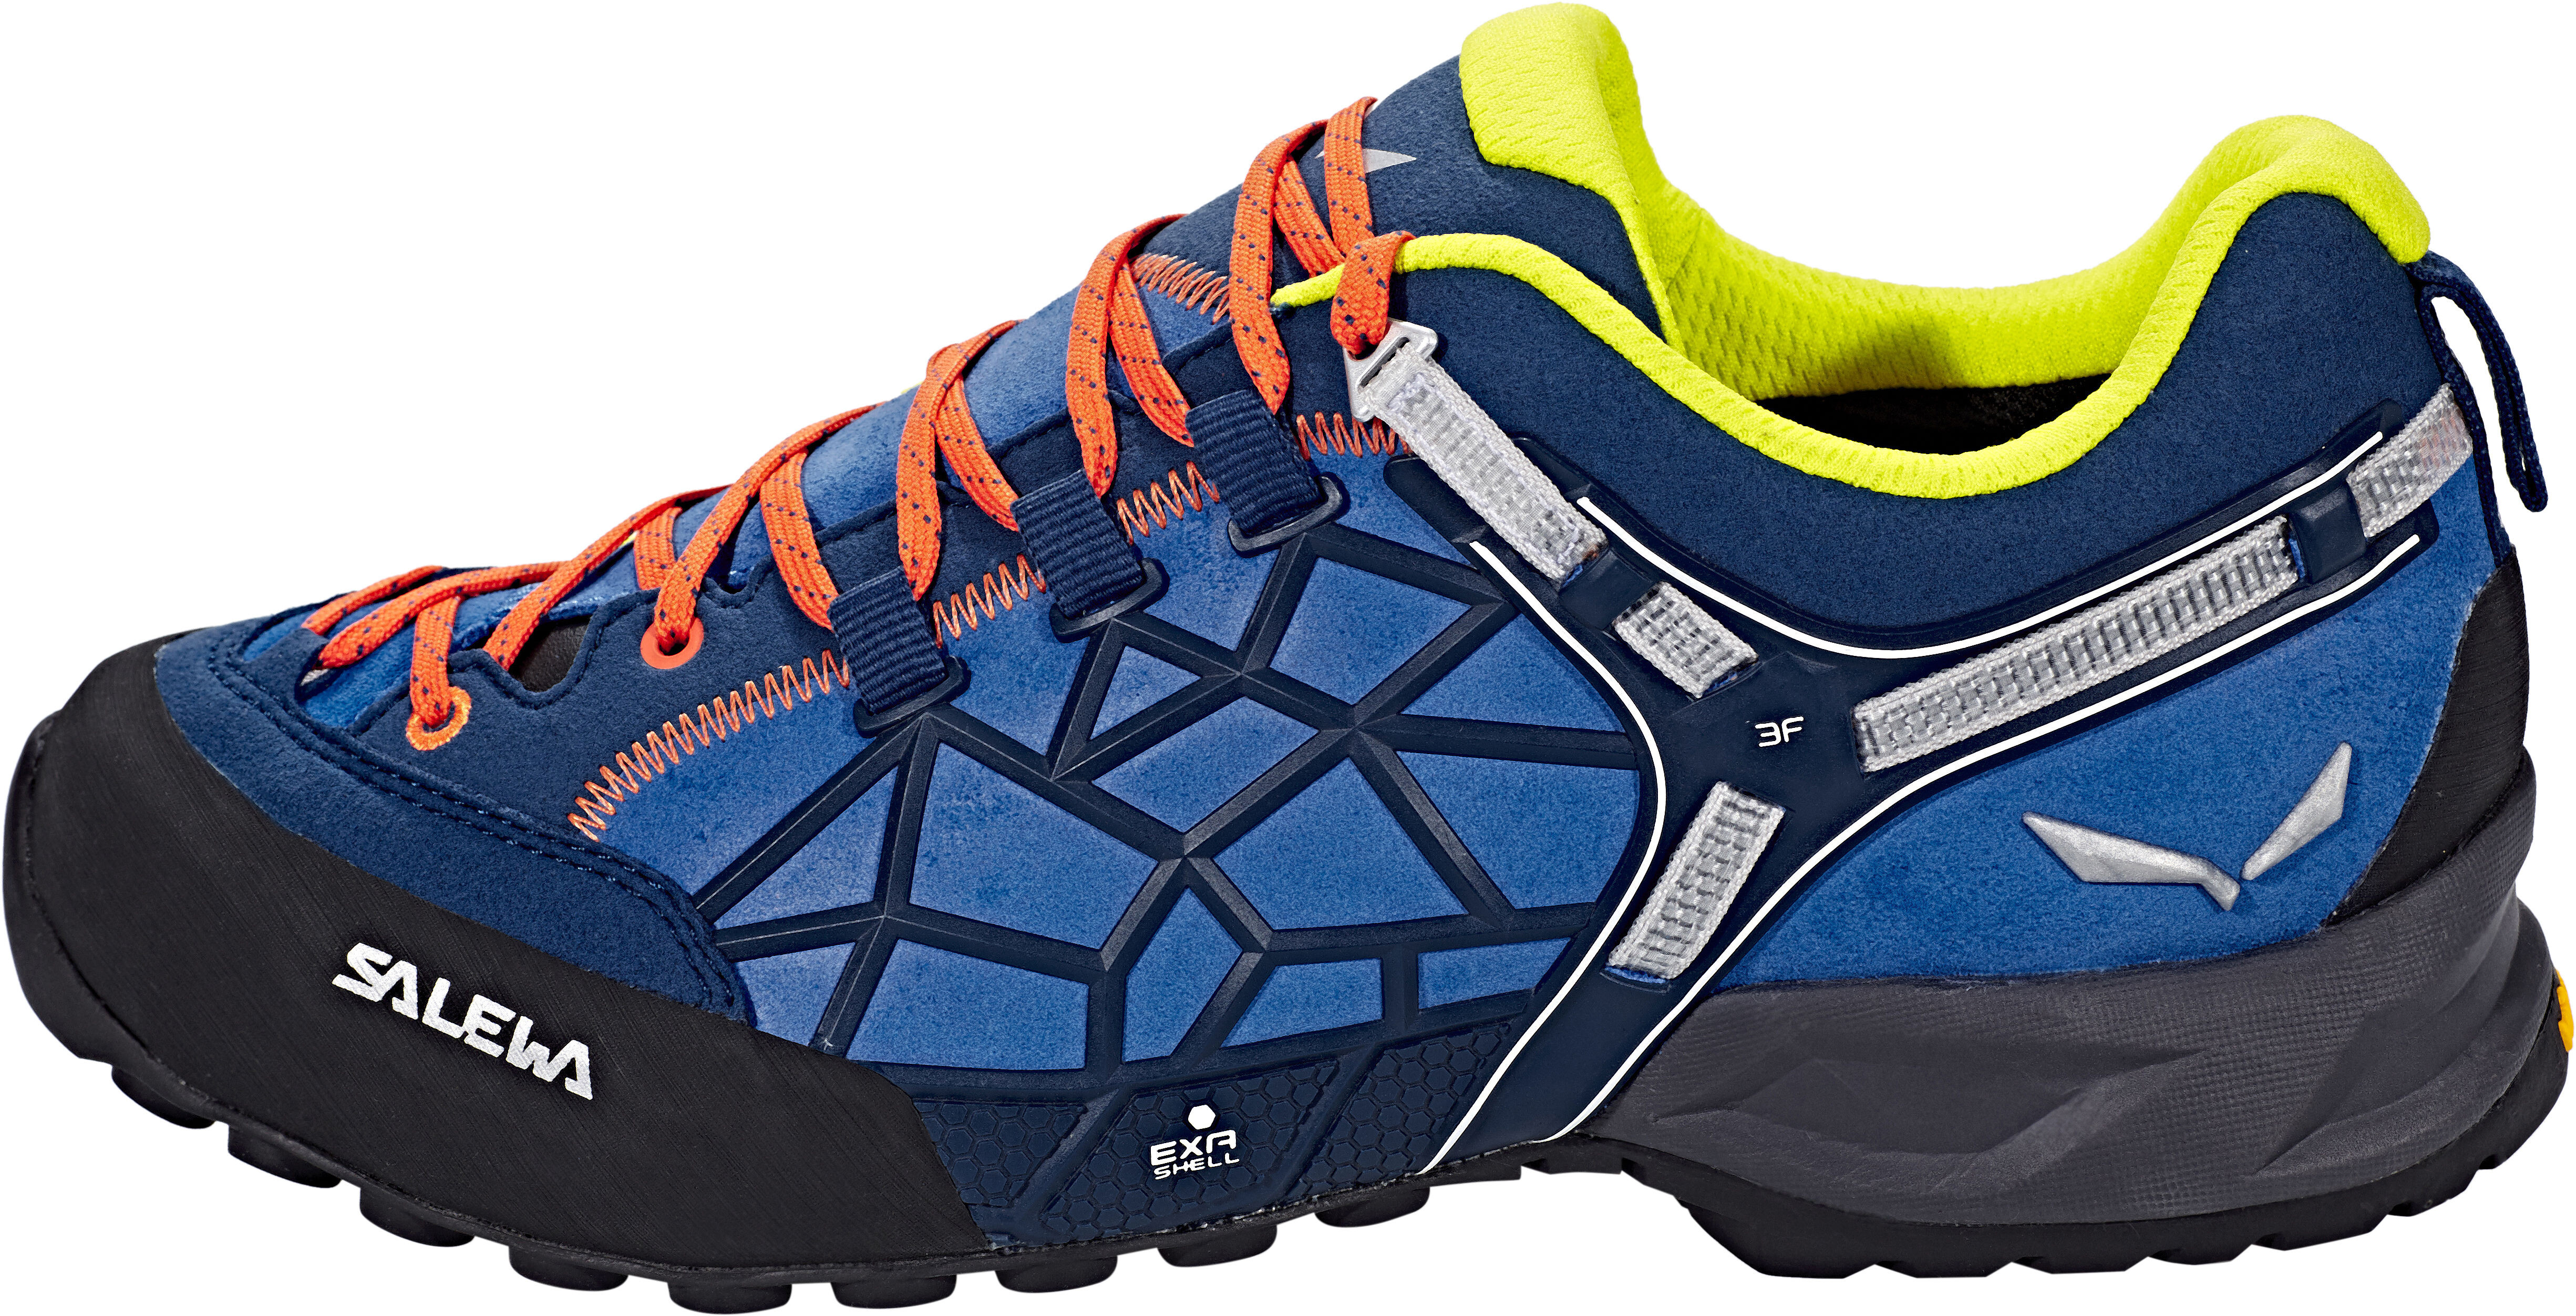 779a00e53730ea Salewa Wildfire Pro Shoes Men Royal Blue Holland